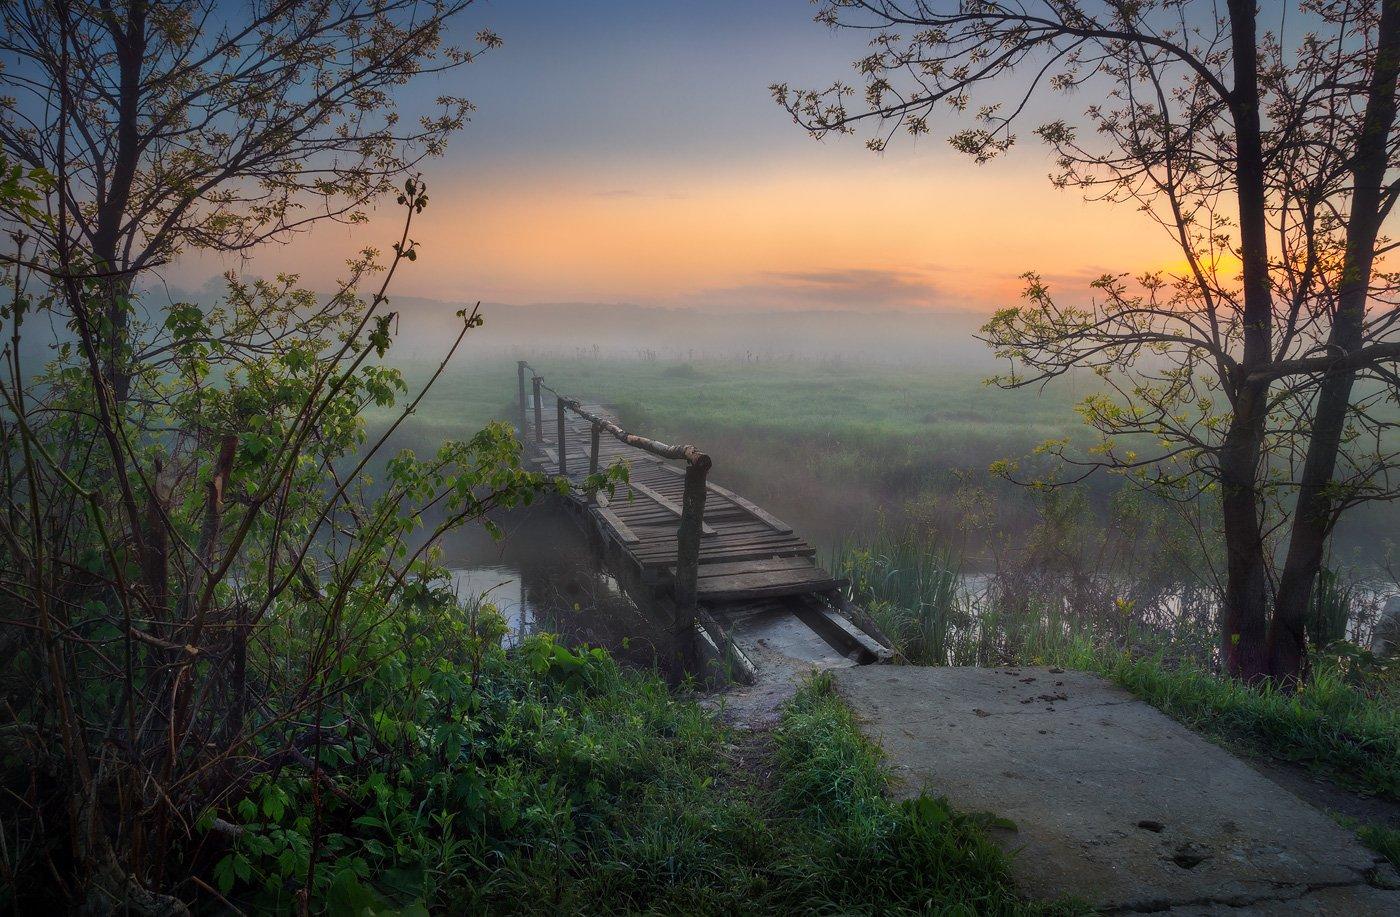 утро, пейзаж, река, туман, деревья, мостик, мосток, sony, Александр Киценко